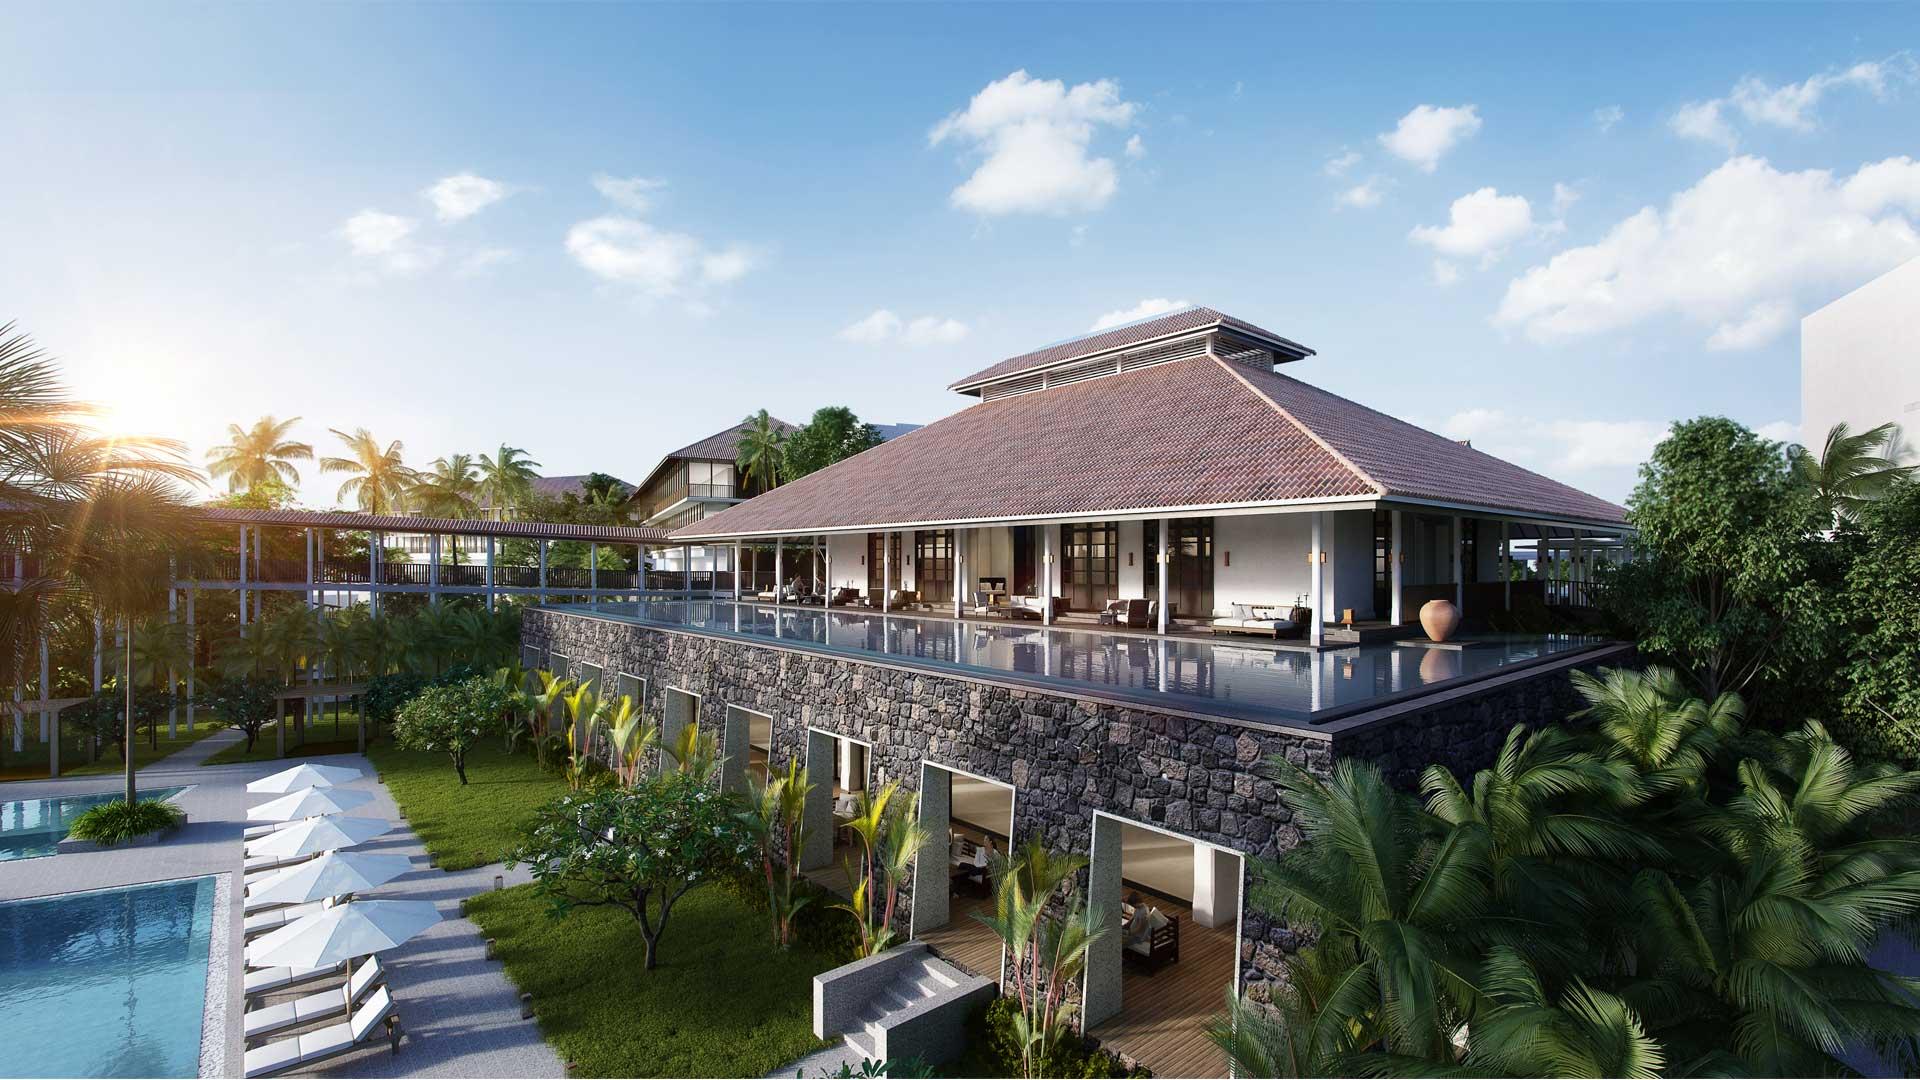 Anantara Desaru Coast Resort & Villas is LIVE with UbiQ's Hotel Management Solution - Touche POS 1